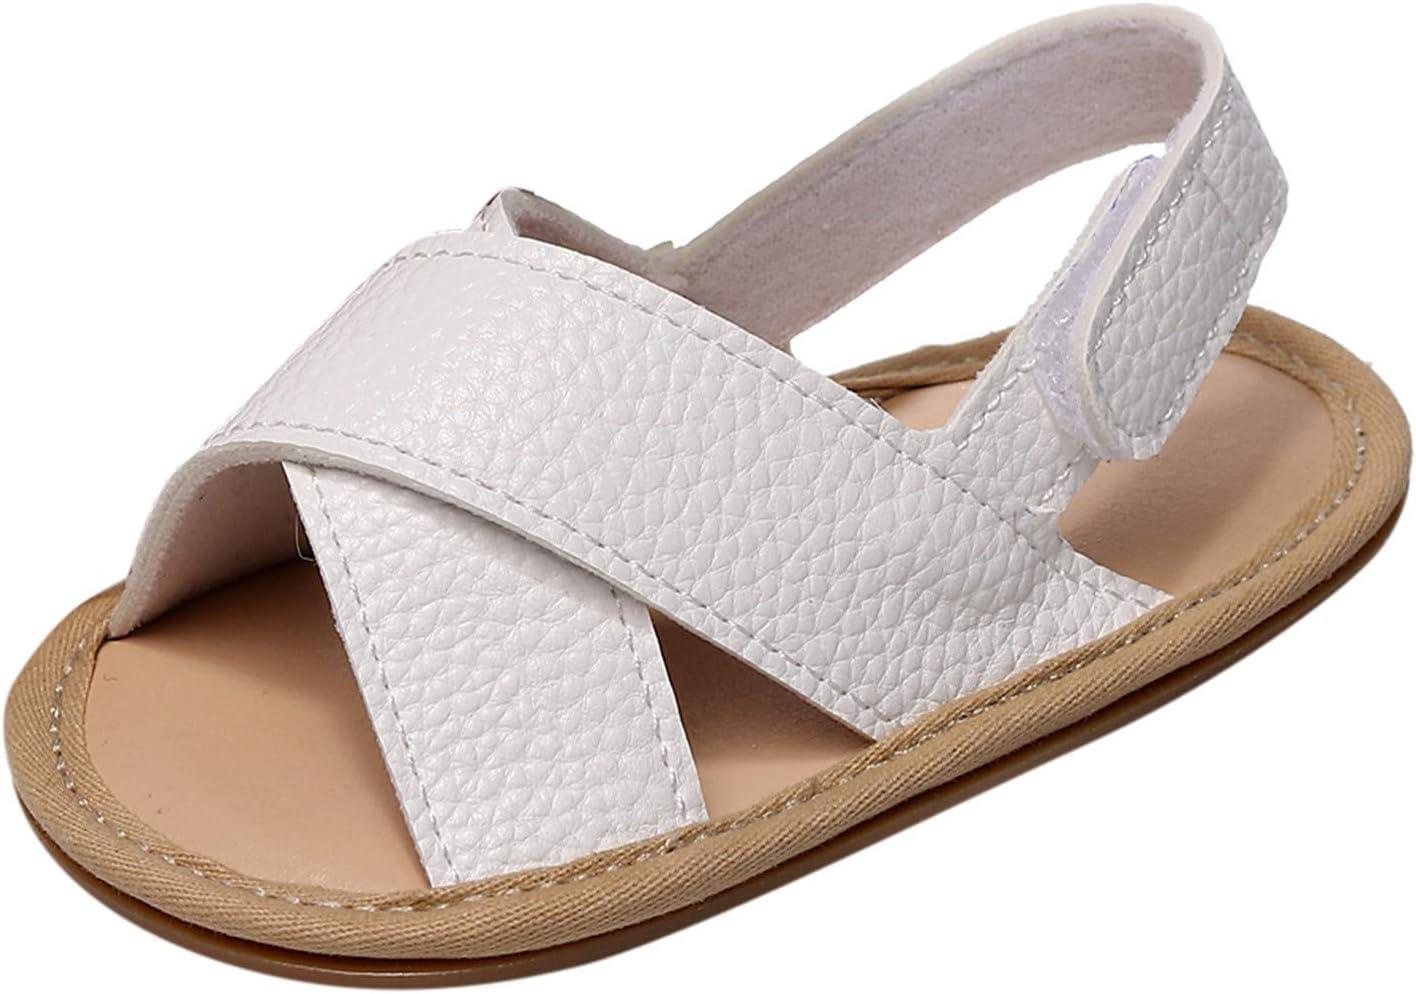 lowest price BFSAUHA Shoes Women Sandals Dressy Clothin Girls' Brand Cheap Sale Venue Baby Gate